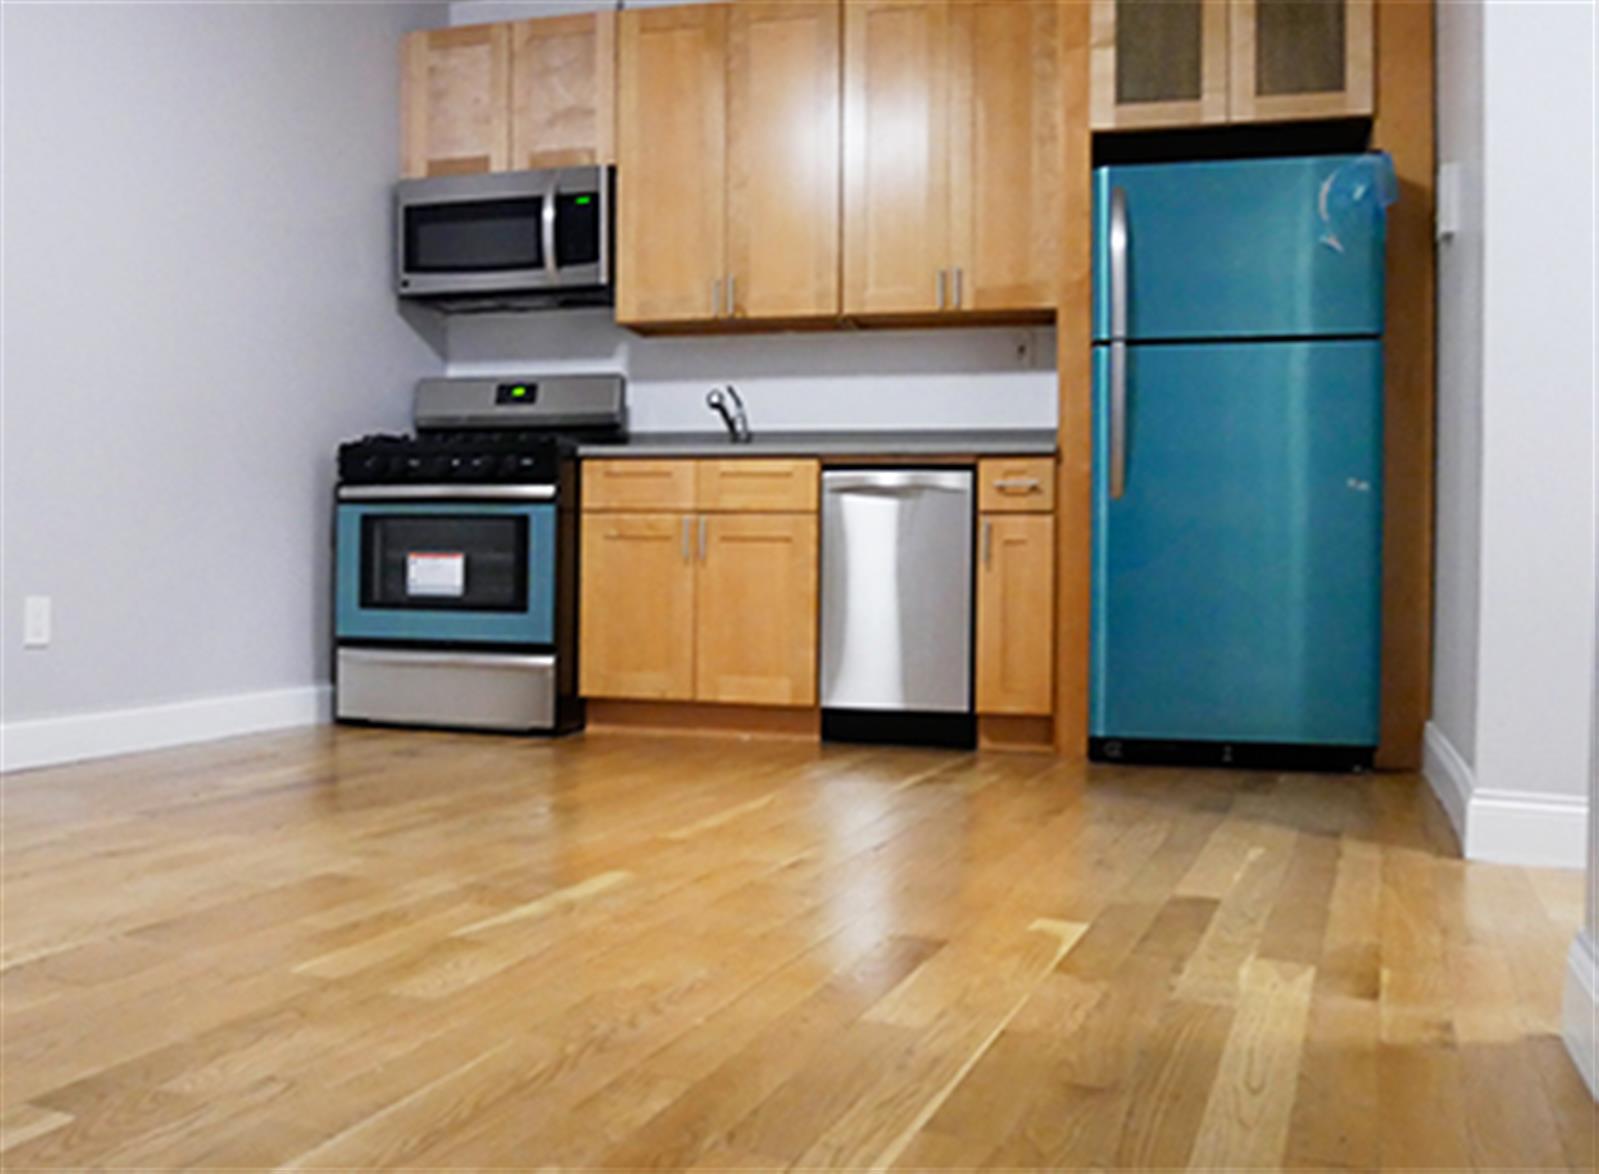 One bedroom - Washington Heights